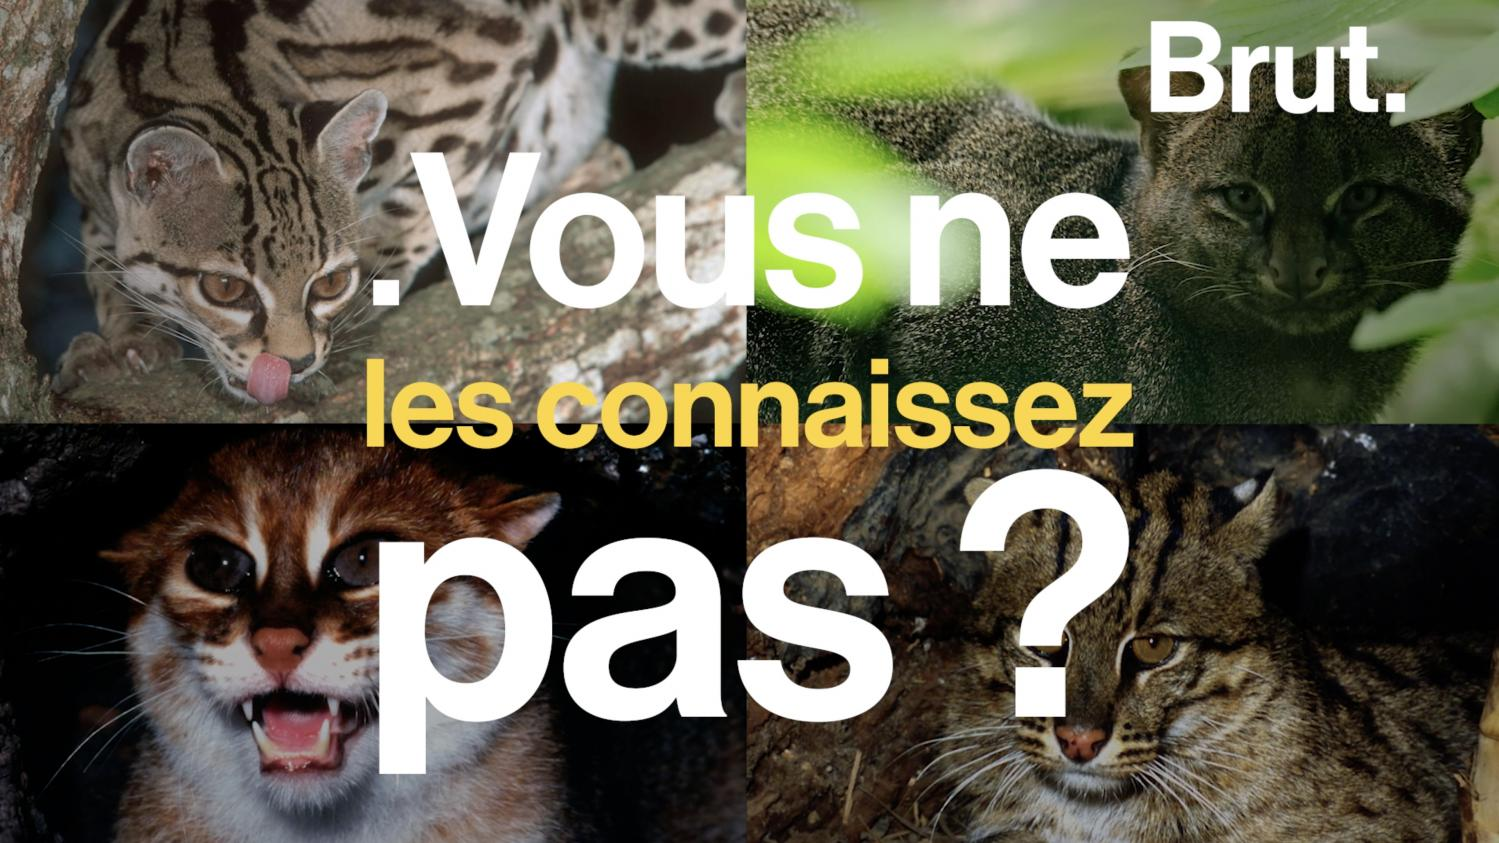 video  le margay  le jaguarondi  le chat  u00e0 t u00eate plate u2026 ces